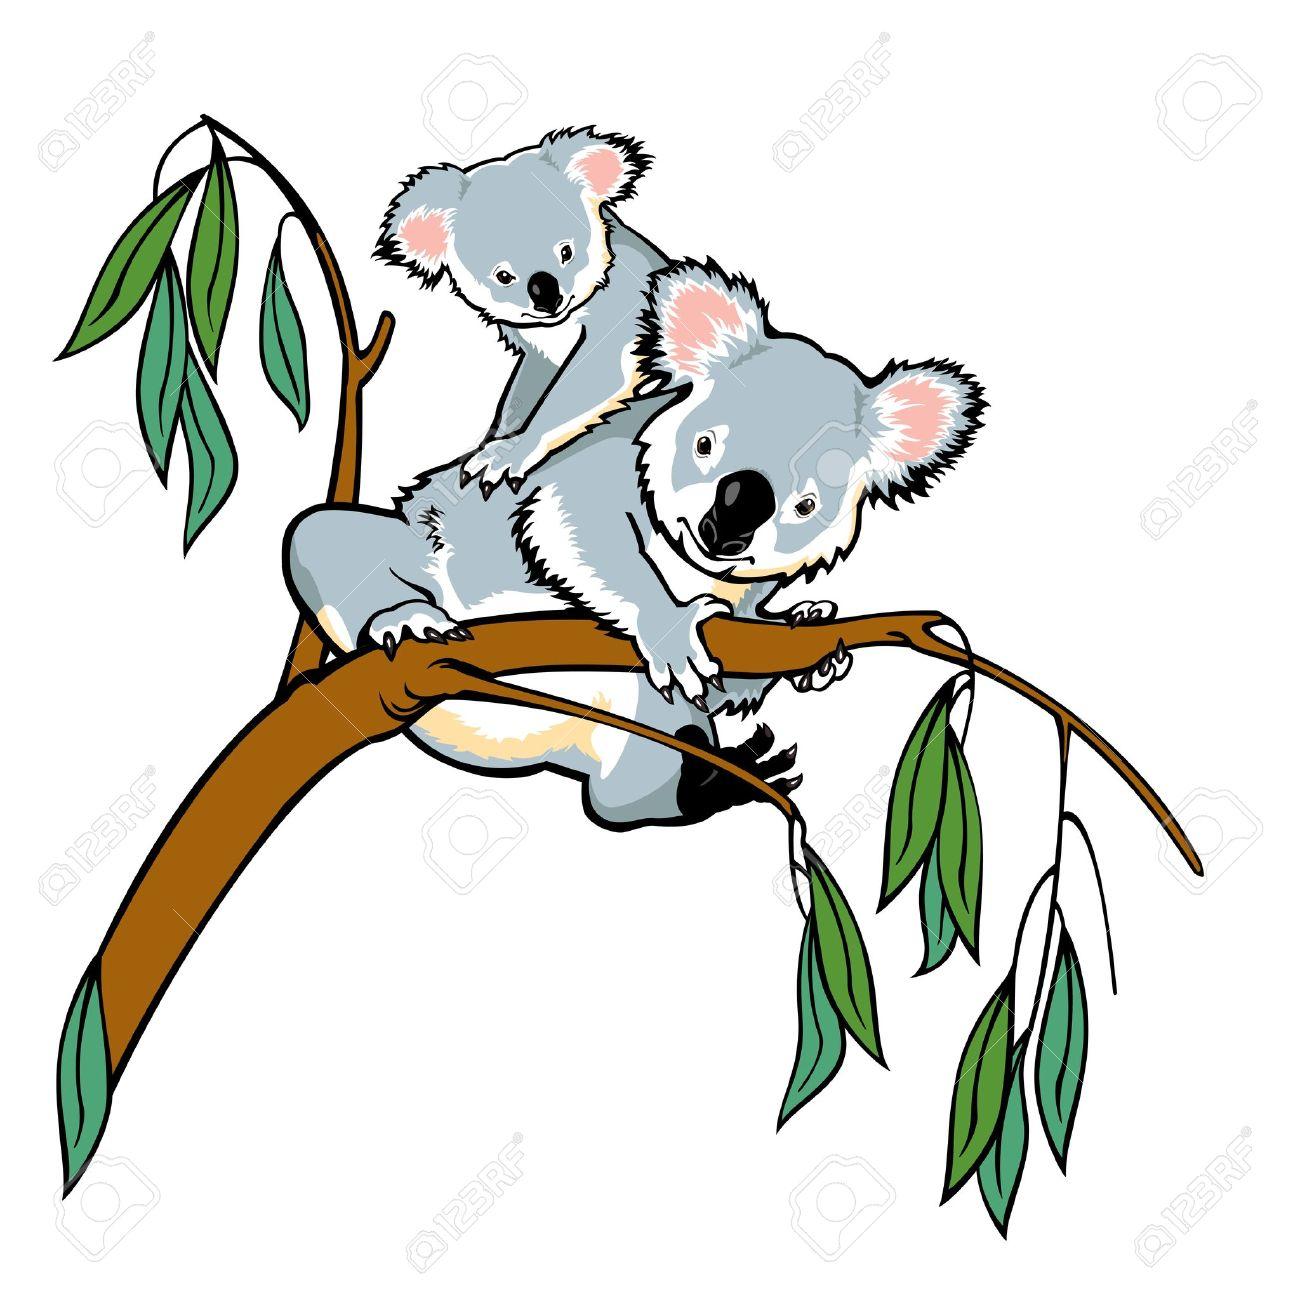 1300x1300 Eucalyptus Clipart Cute Koala 3508594